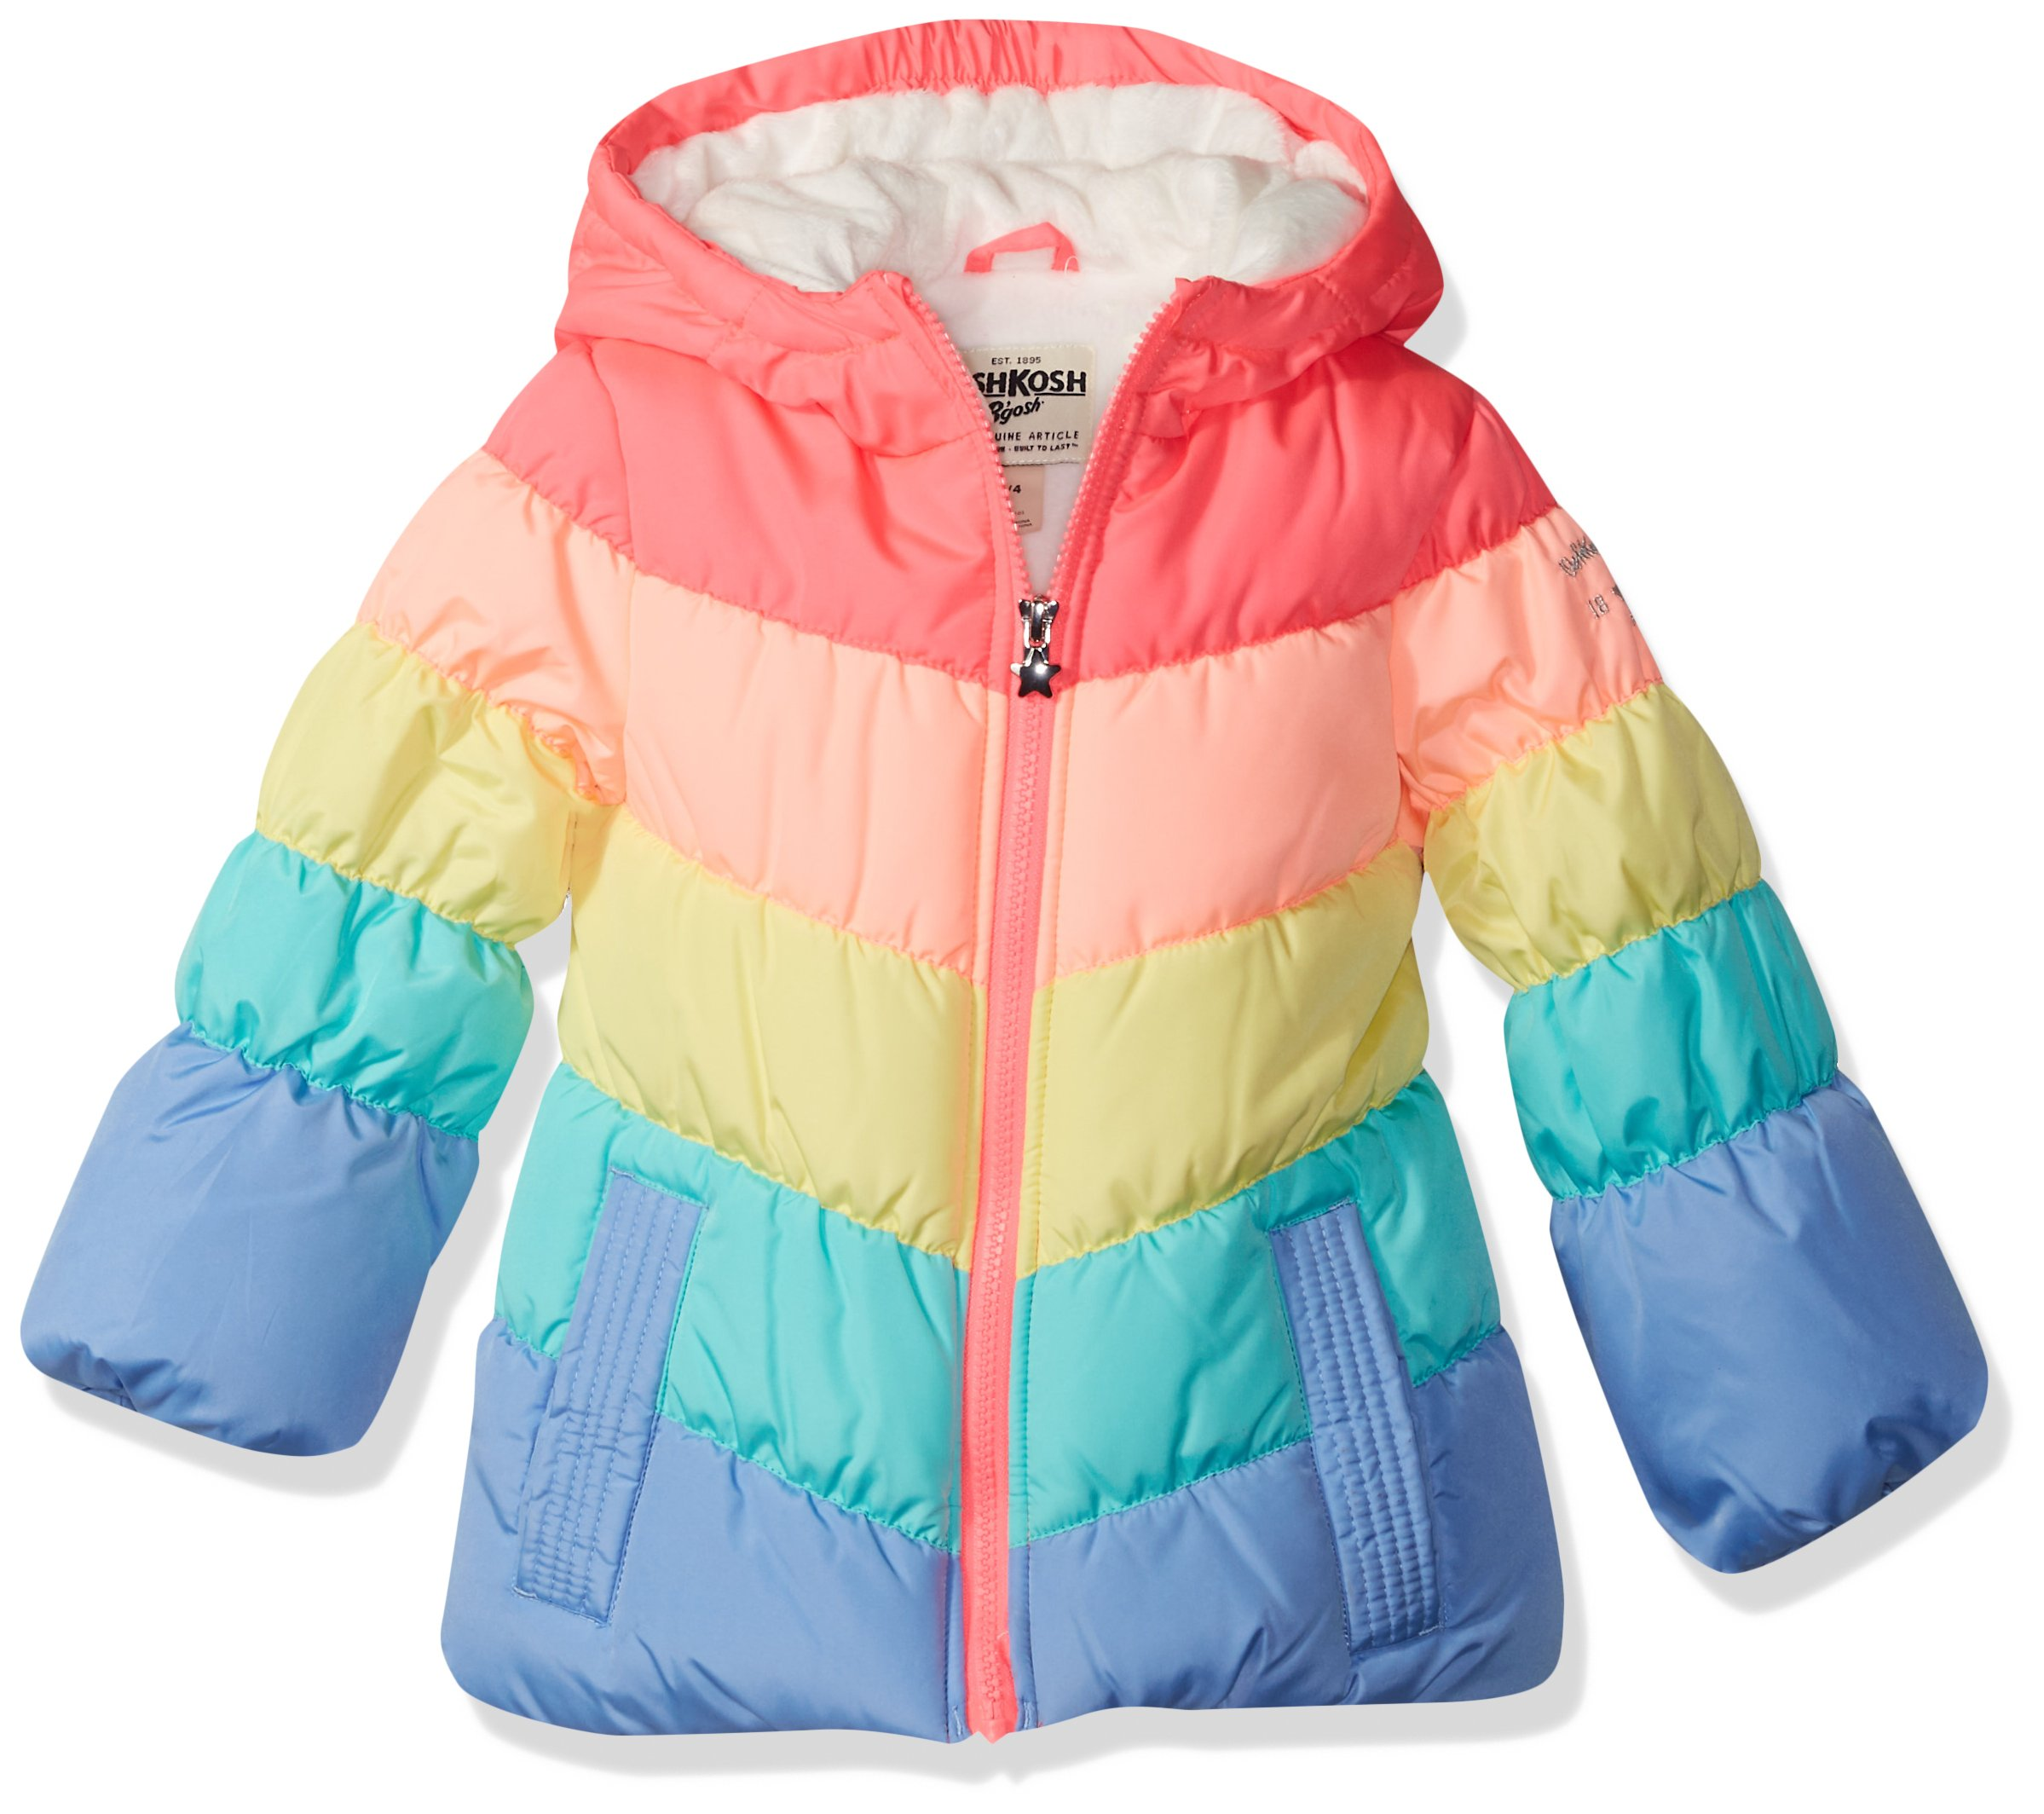 OshKosh B'Gosh Baby Girls Perfect Colorblocked Heavyweight Jacket Coat, Rainbow, 24M by OshKosh B'Gosh